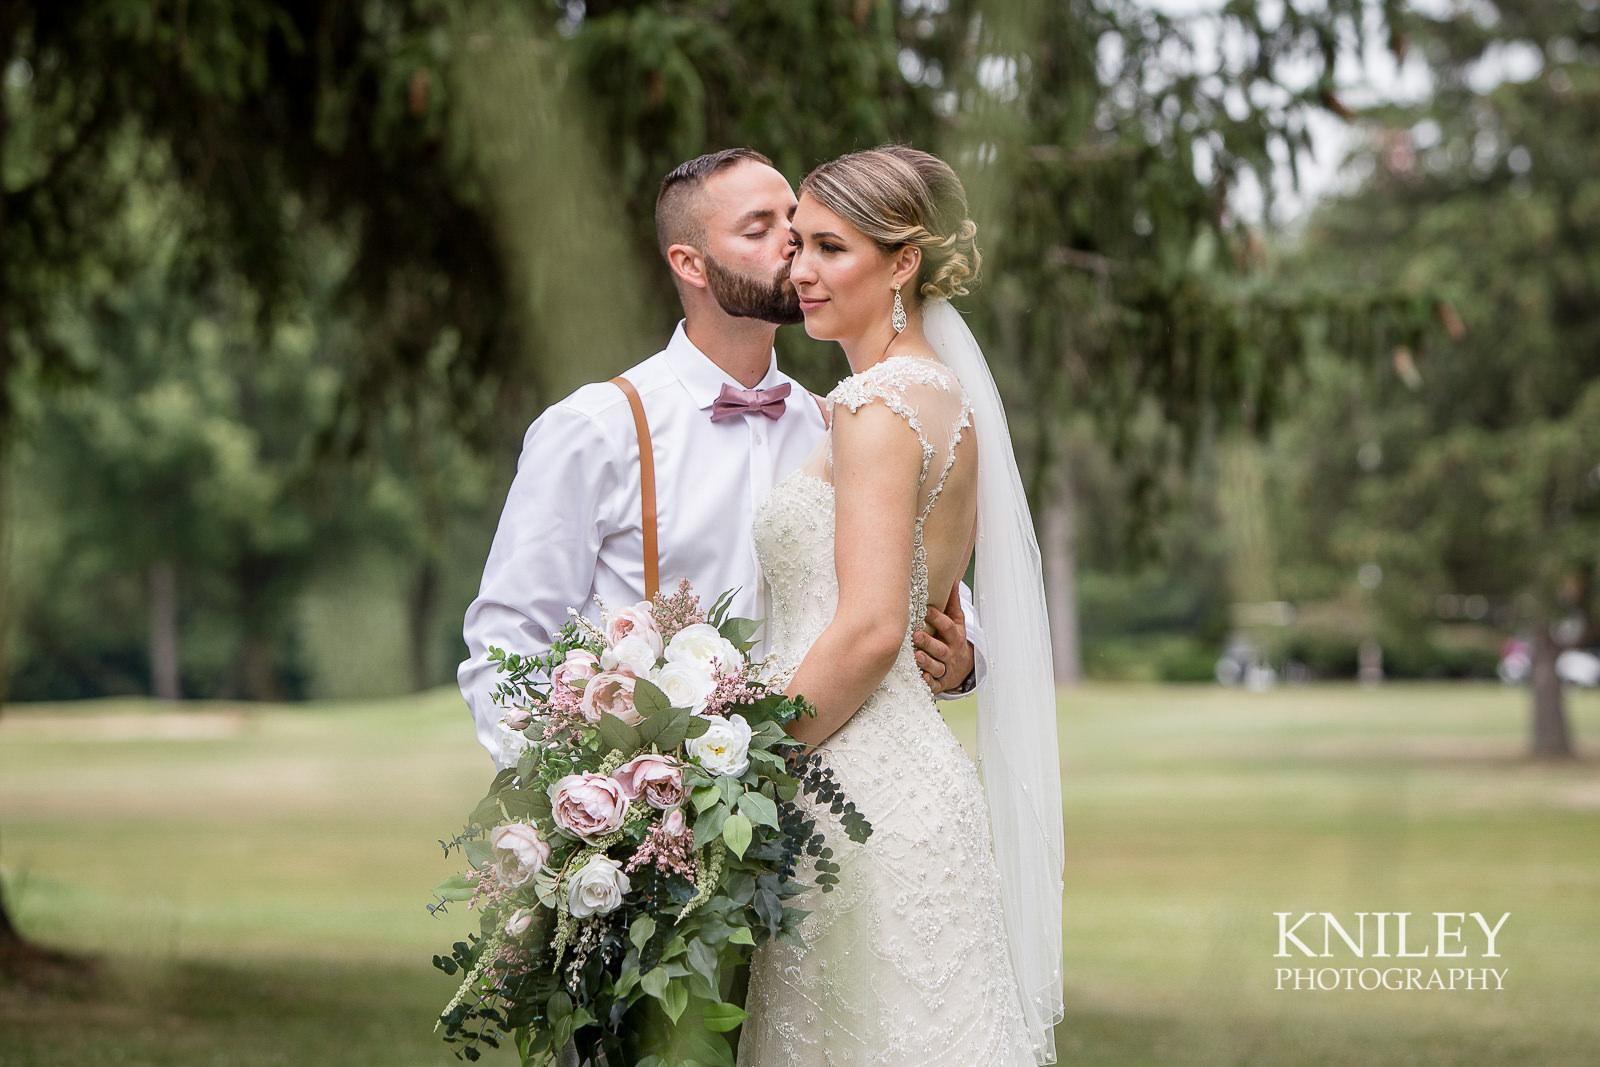 065 - Ontario Golf Club Wedding Pictures - IMG_7772.jpg